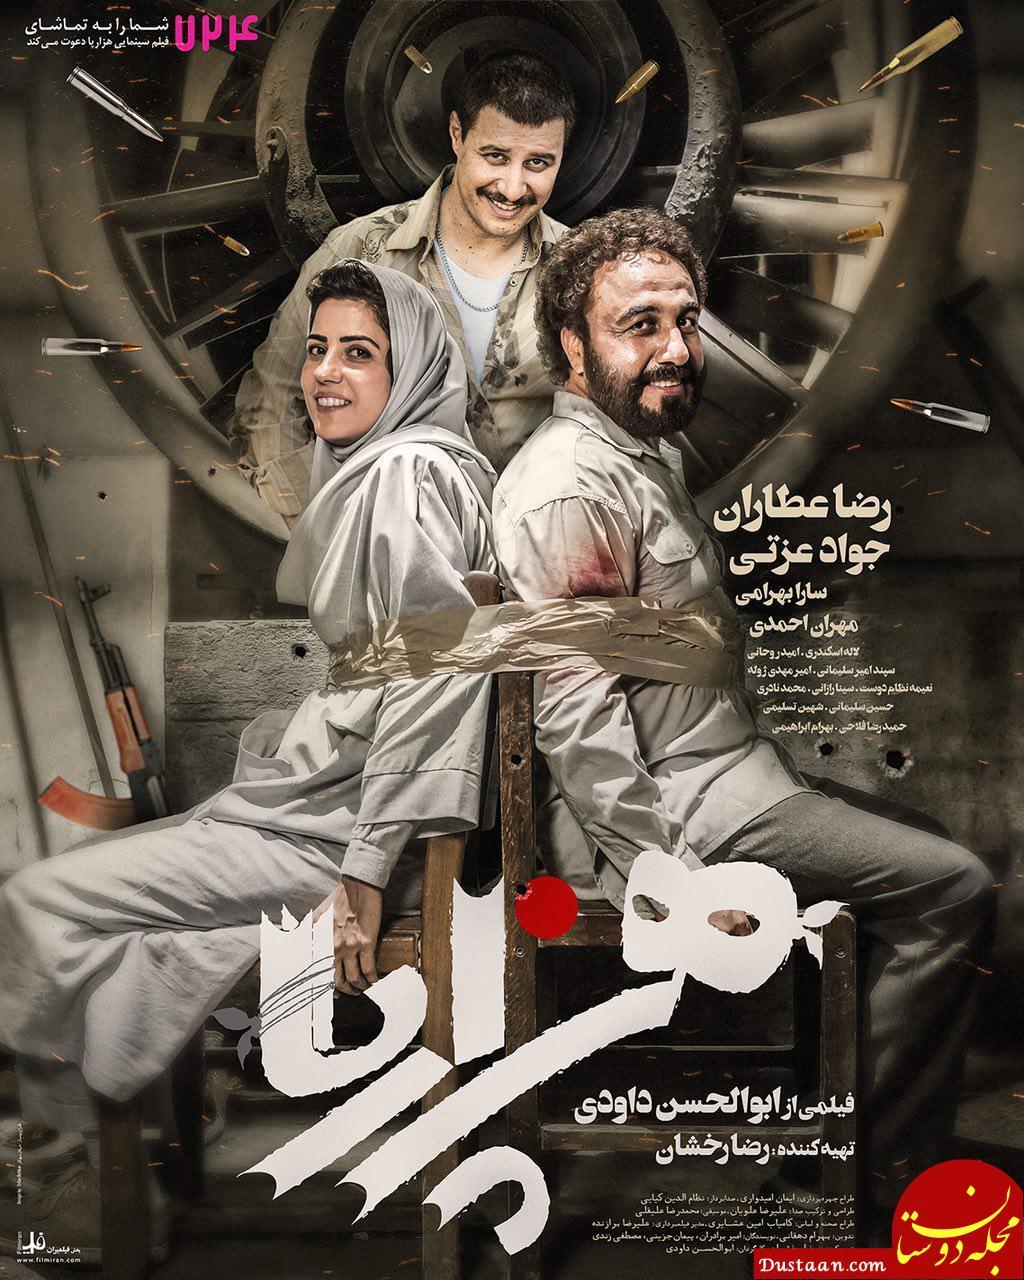 www.dustaan.com رونمایی از پوستر فیلم سینمایی «هزارپا» با بازی رضا عطاران +عکس